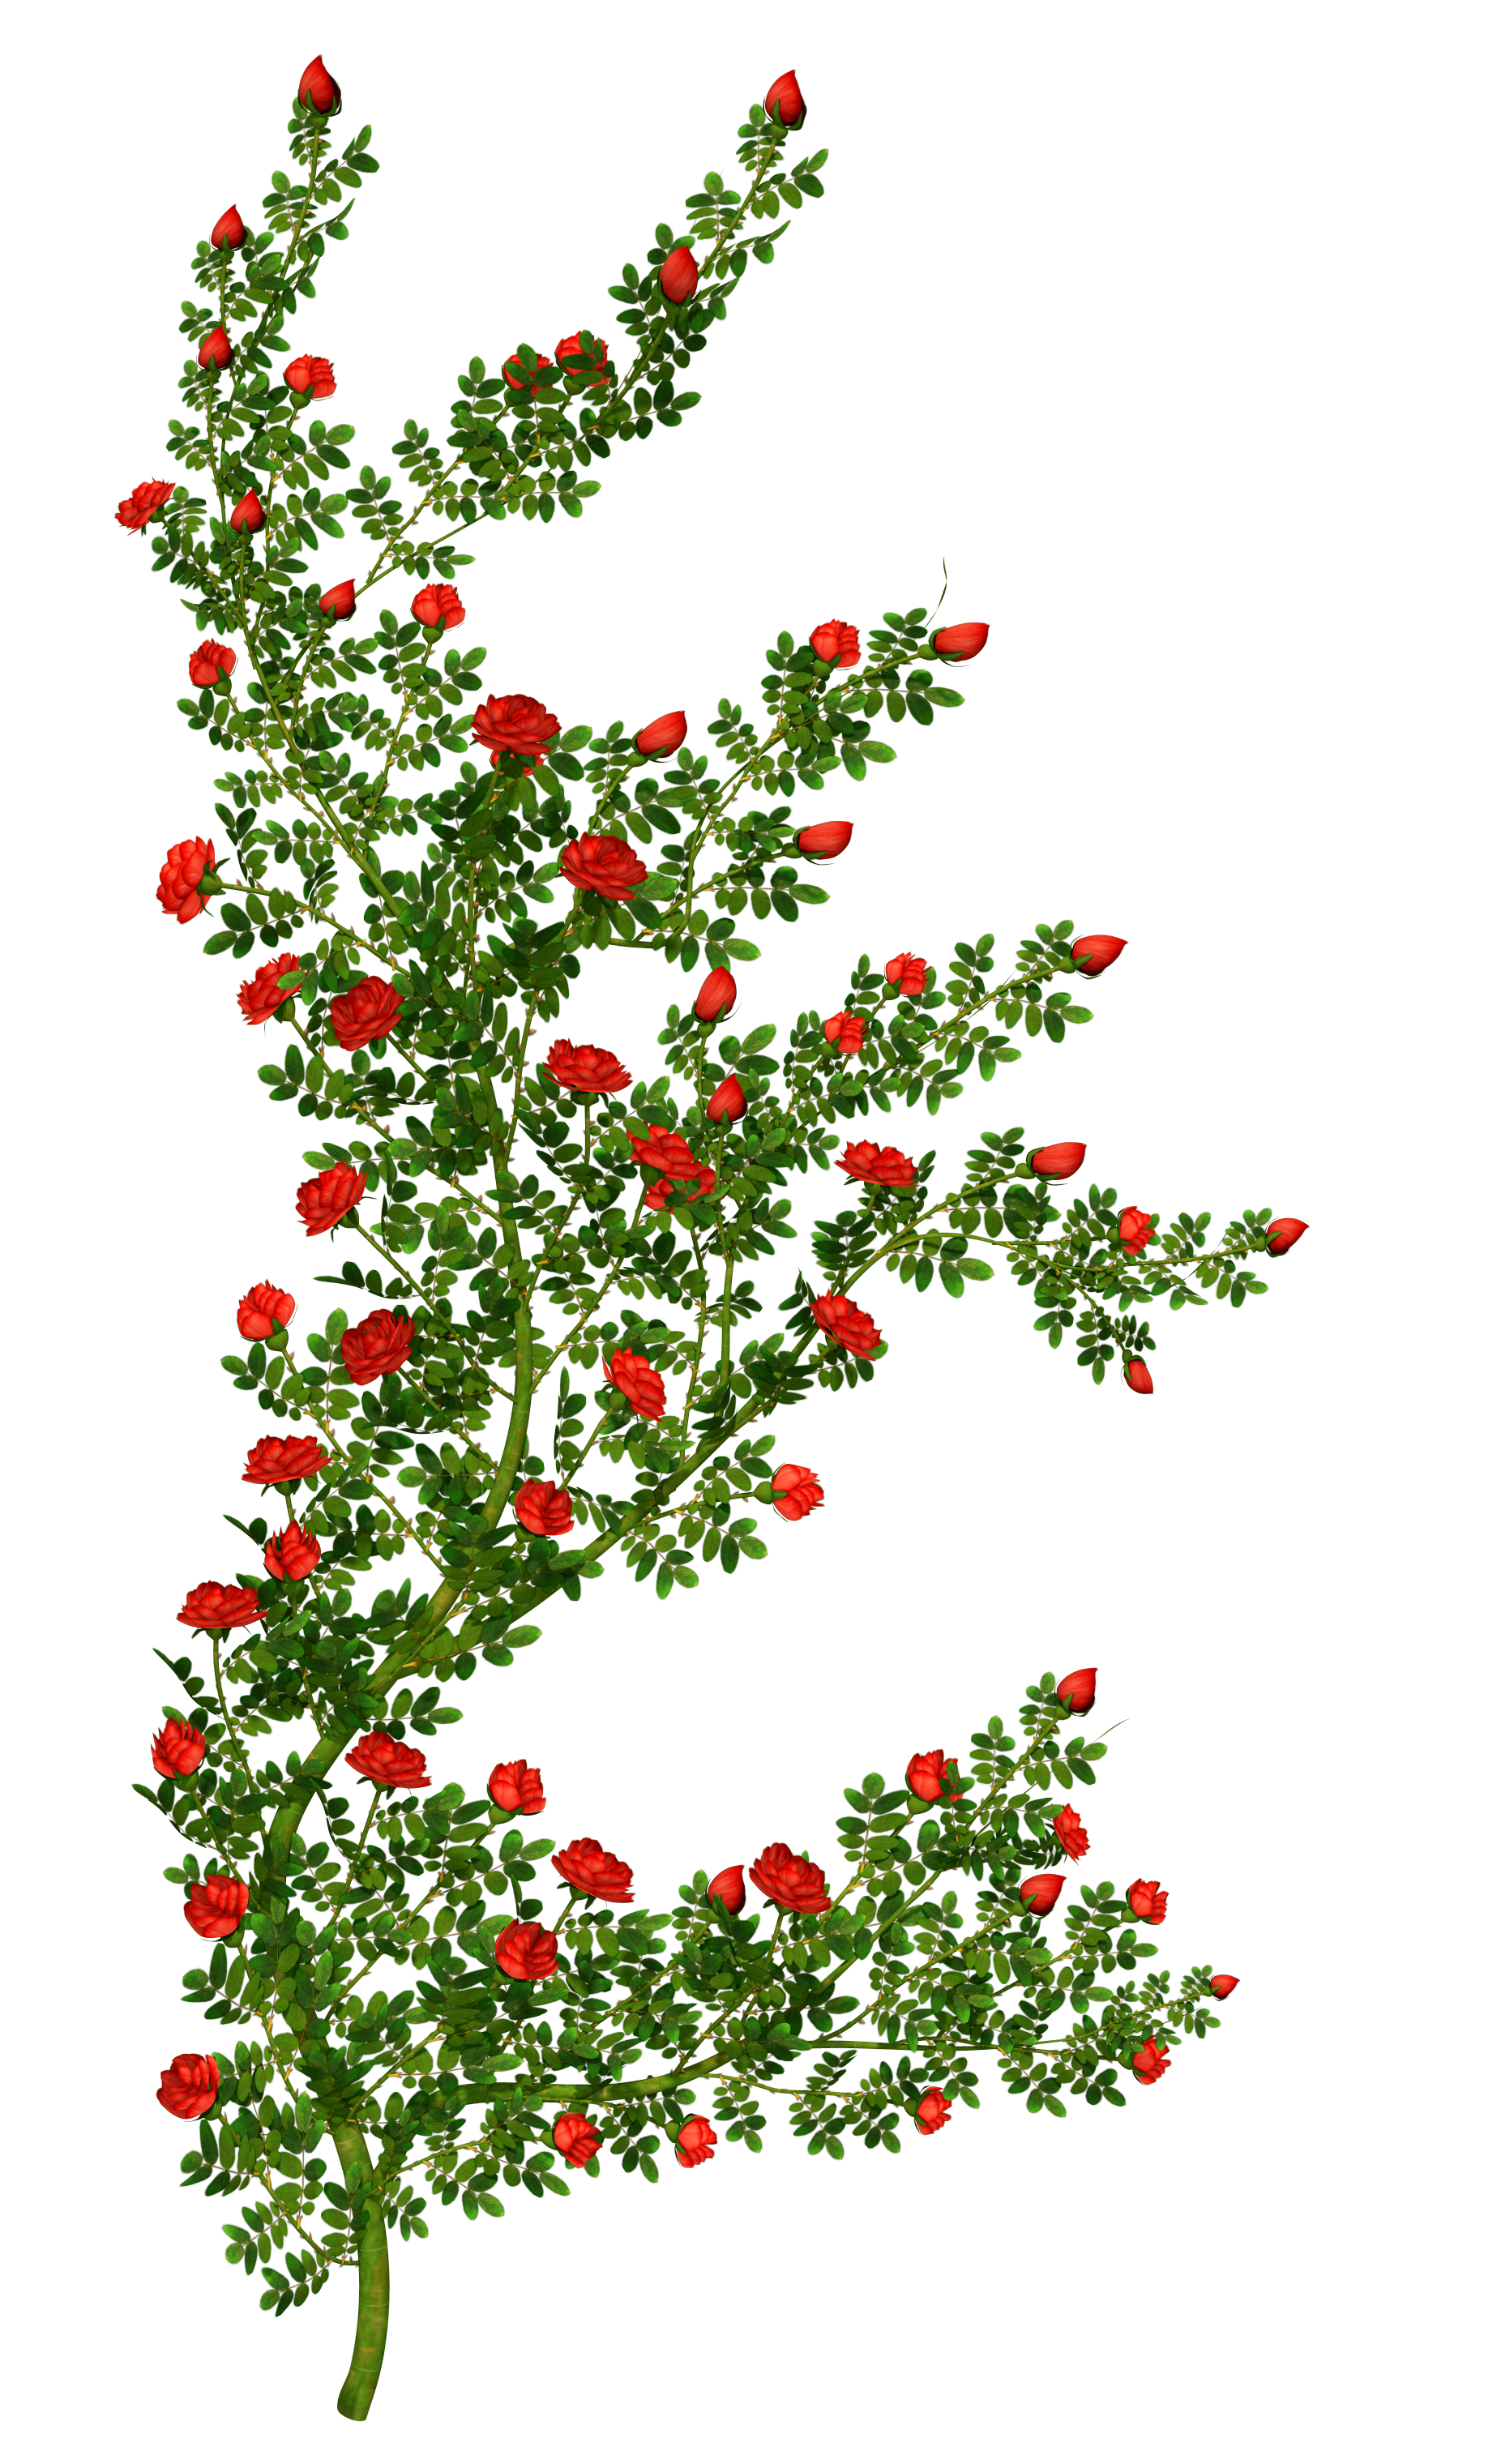 Rosebush picture gallery yopriceville. Bush clipart transparent flower